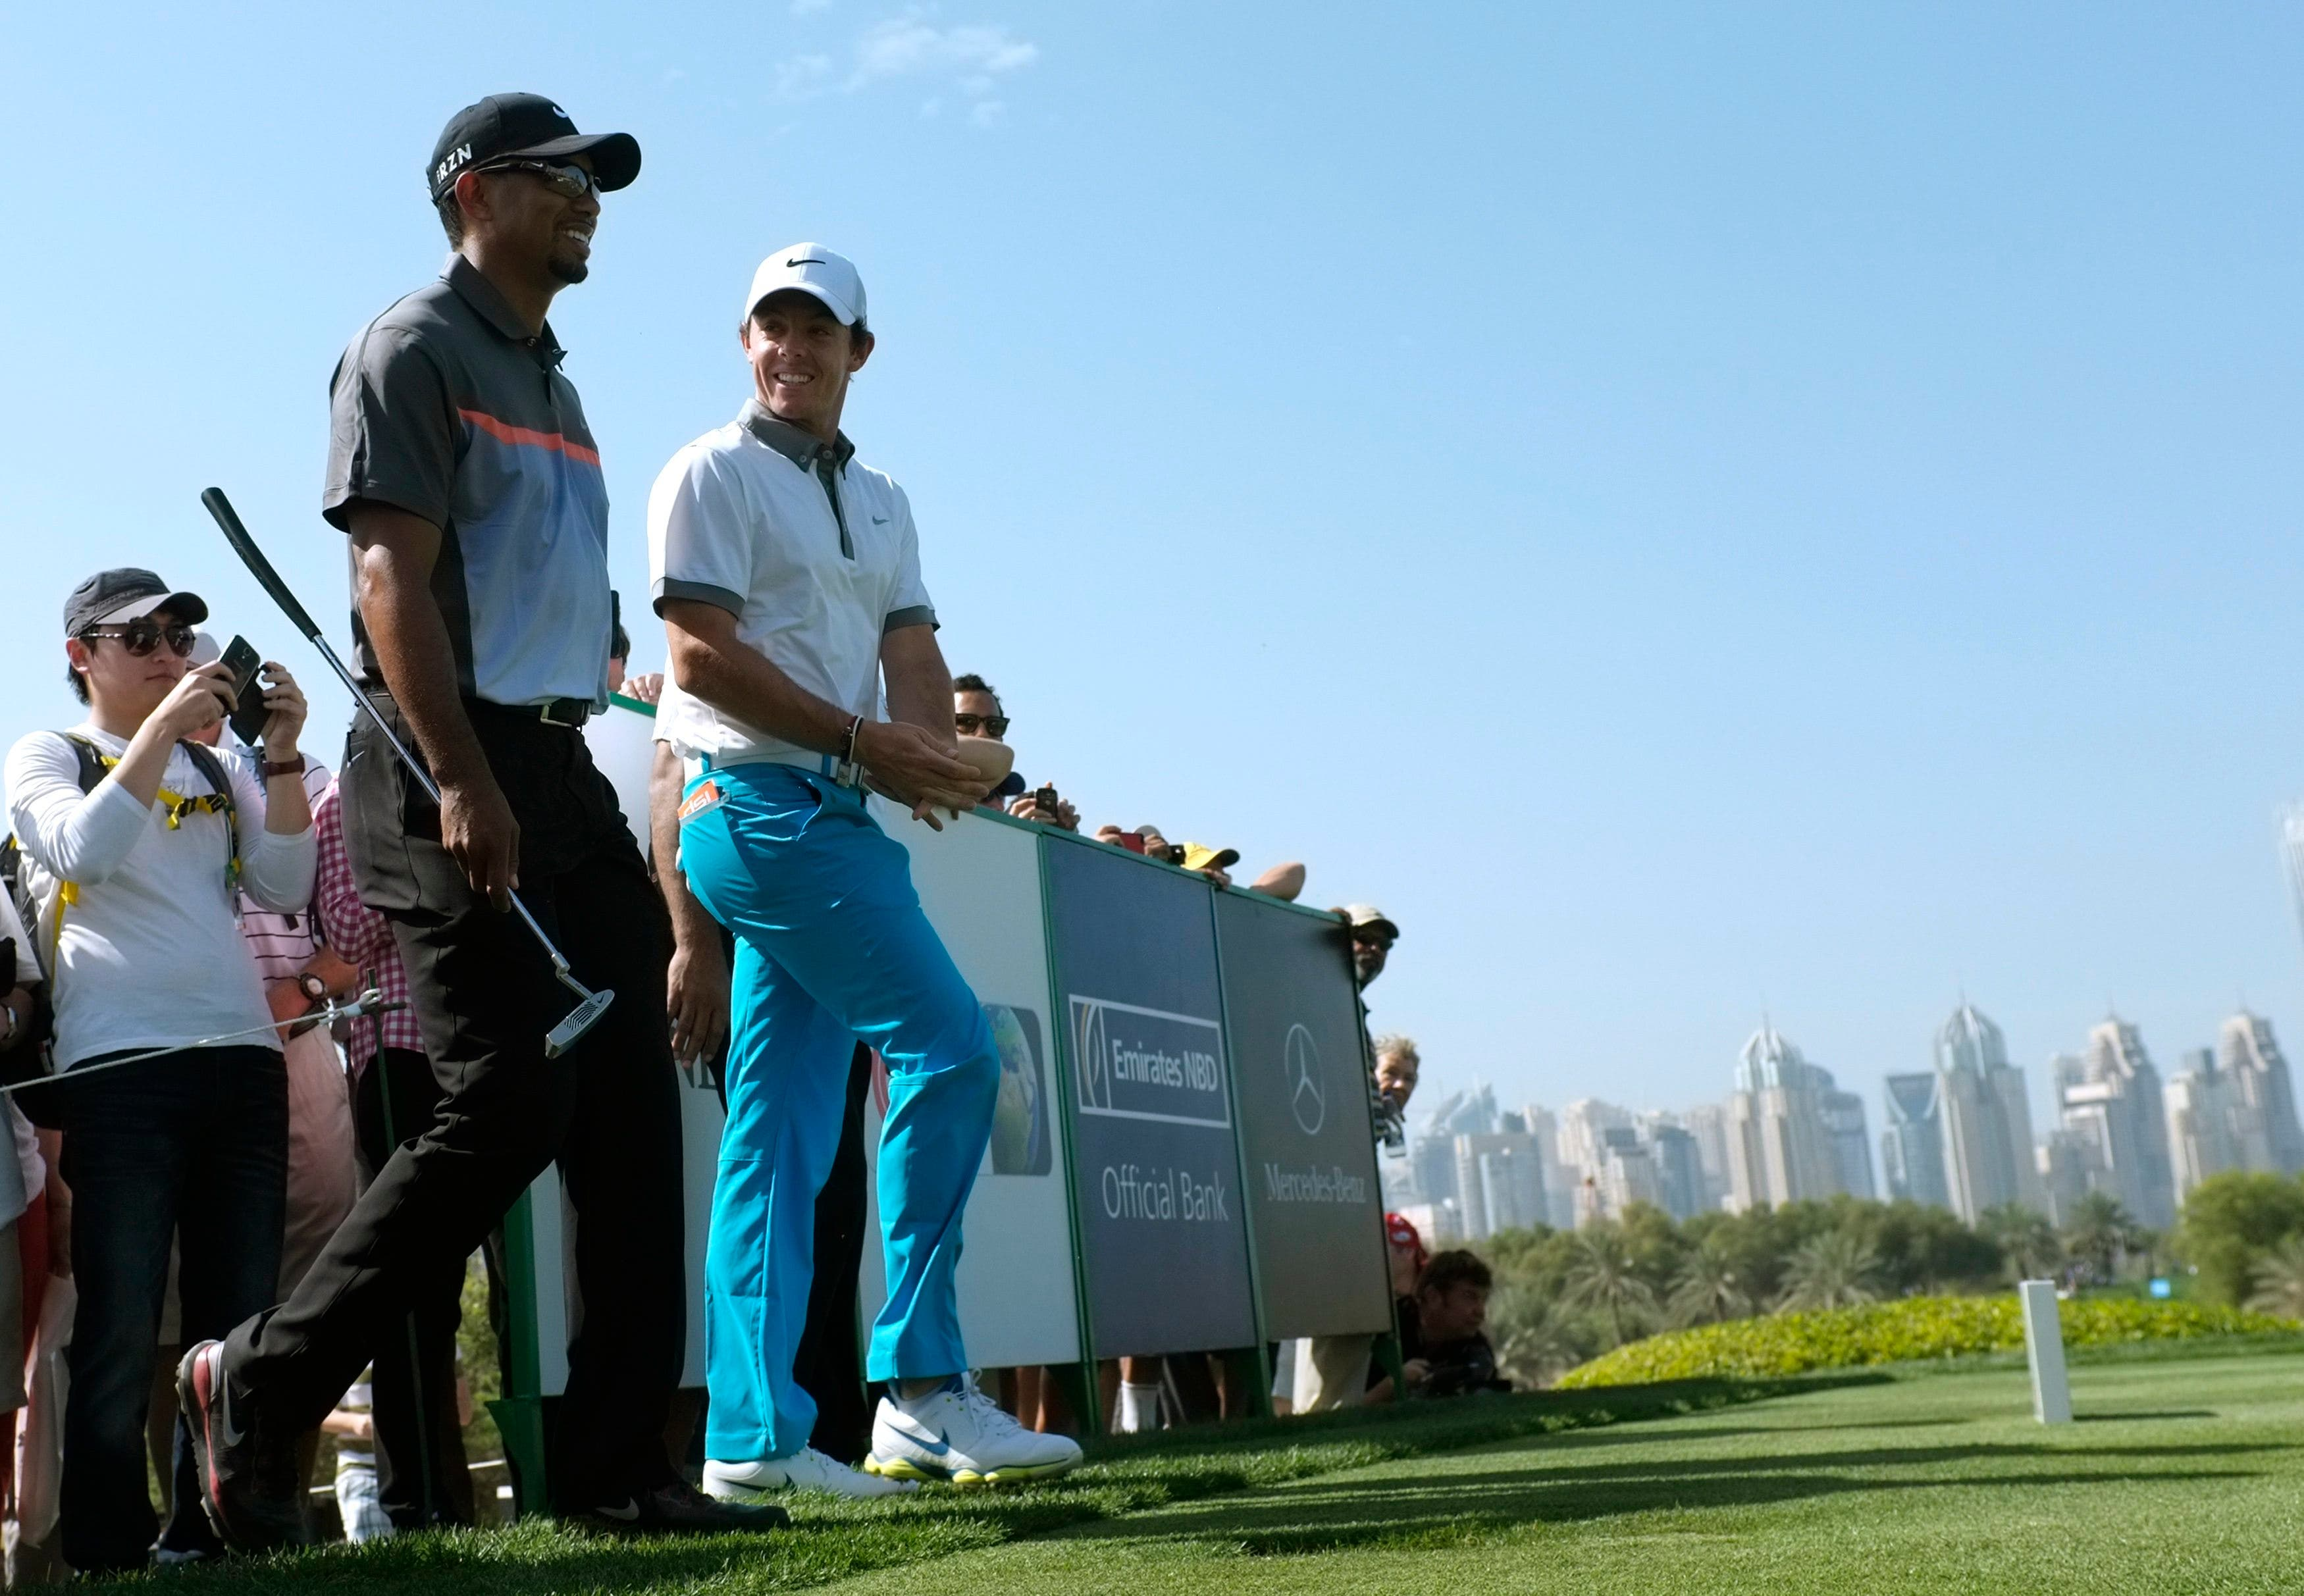 The 2014 Omega Dubai Desert Classic in Dubai